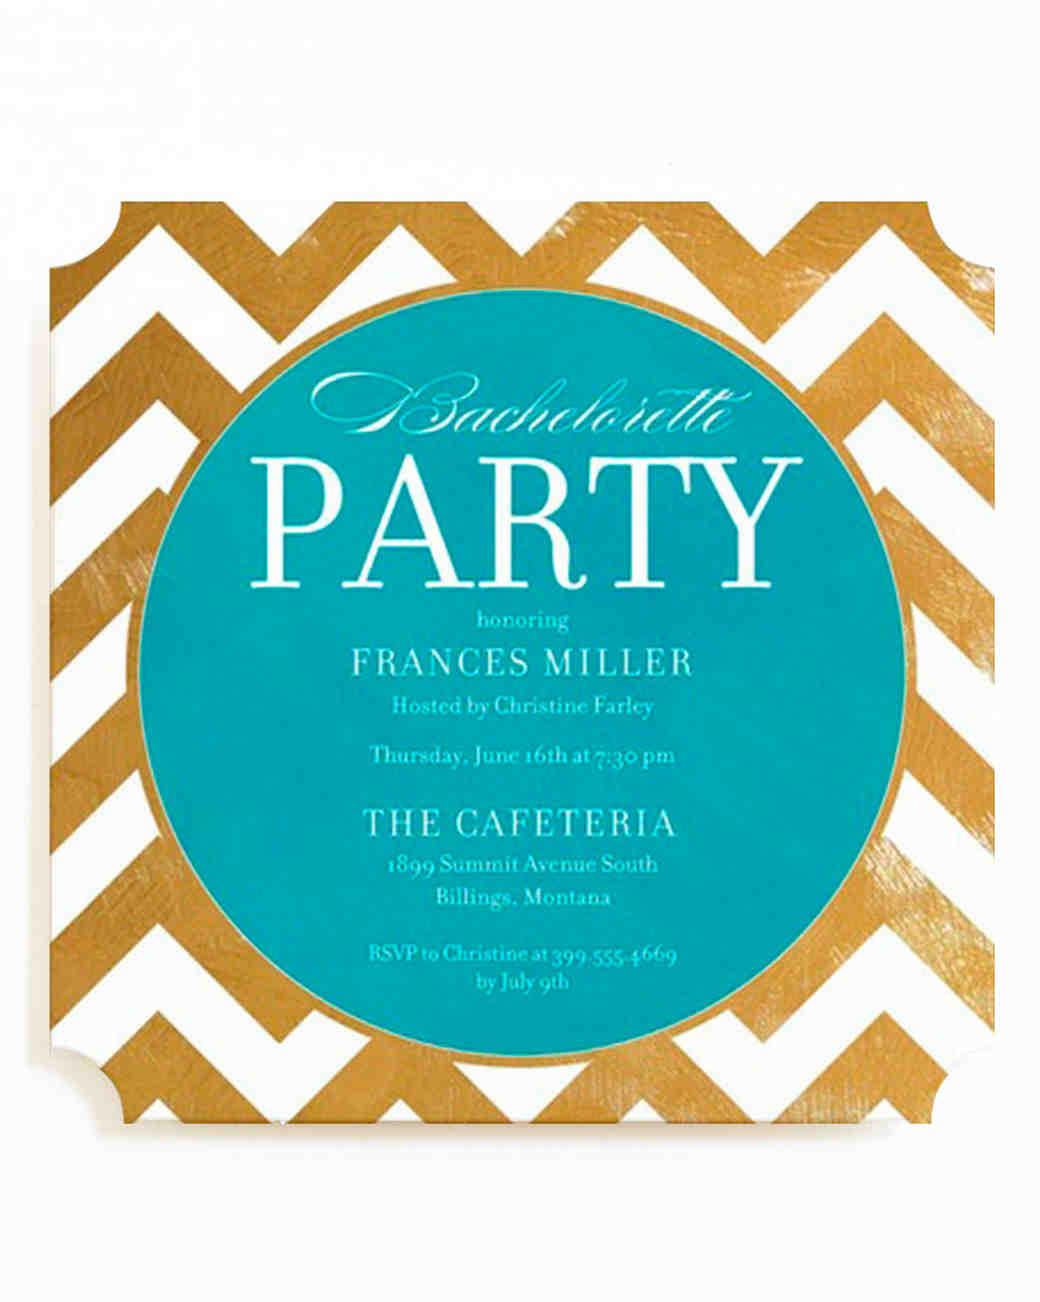 wedding-paper-divas-party-invitations-1135354-just-you-girls-0914.jpg